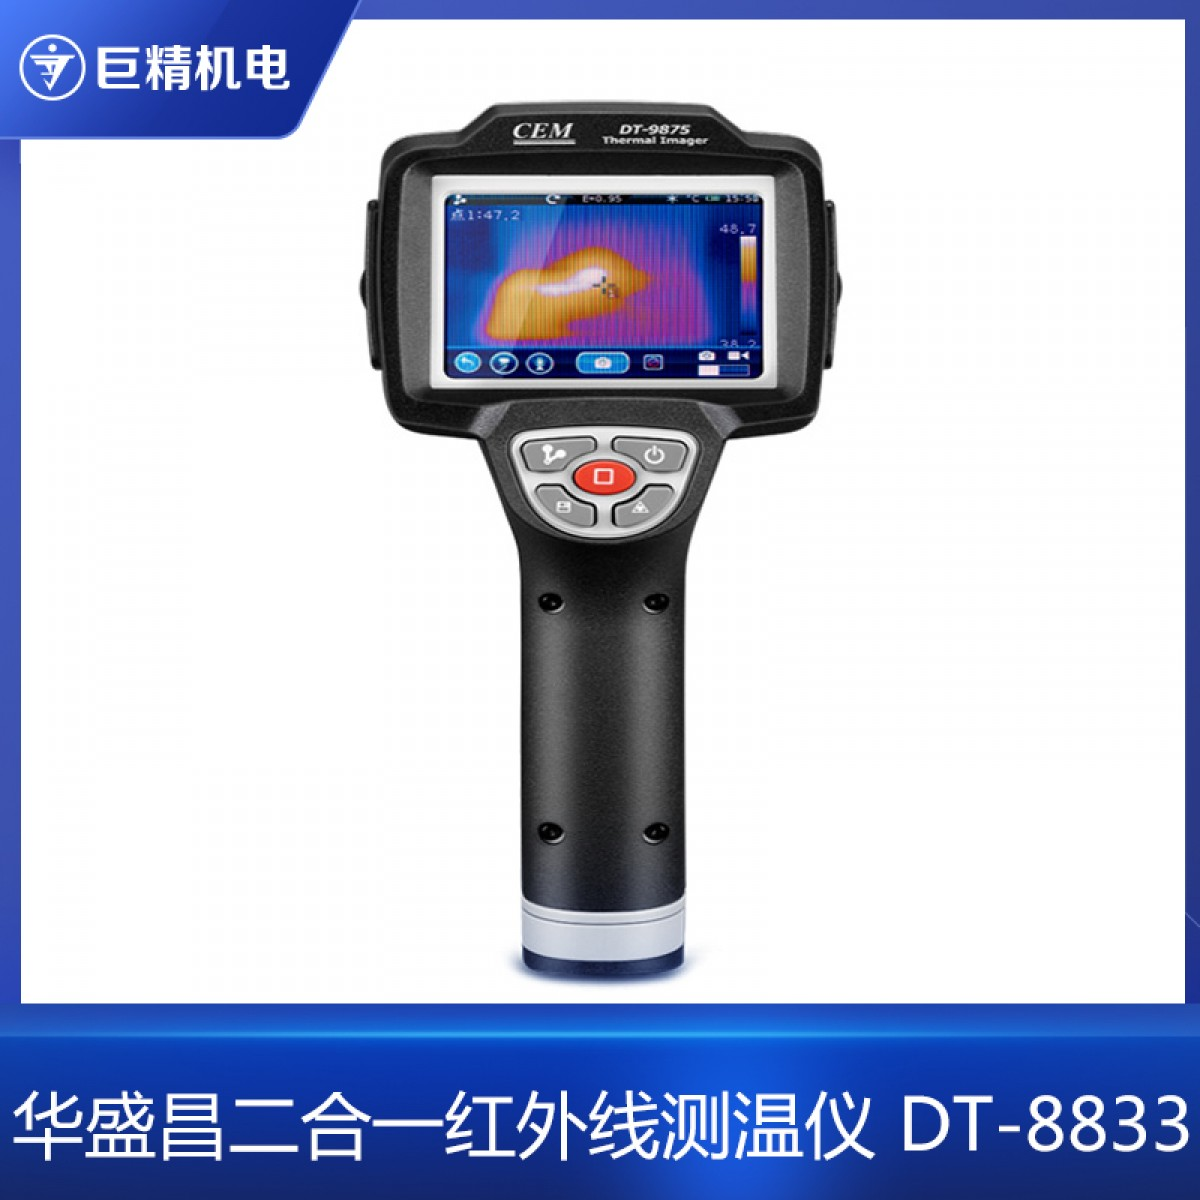 CEM华盛昌 DT-9873B 经典型红外热像仪